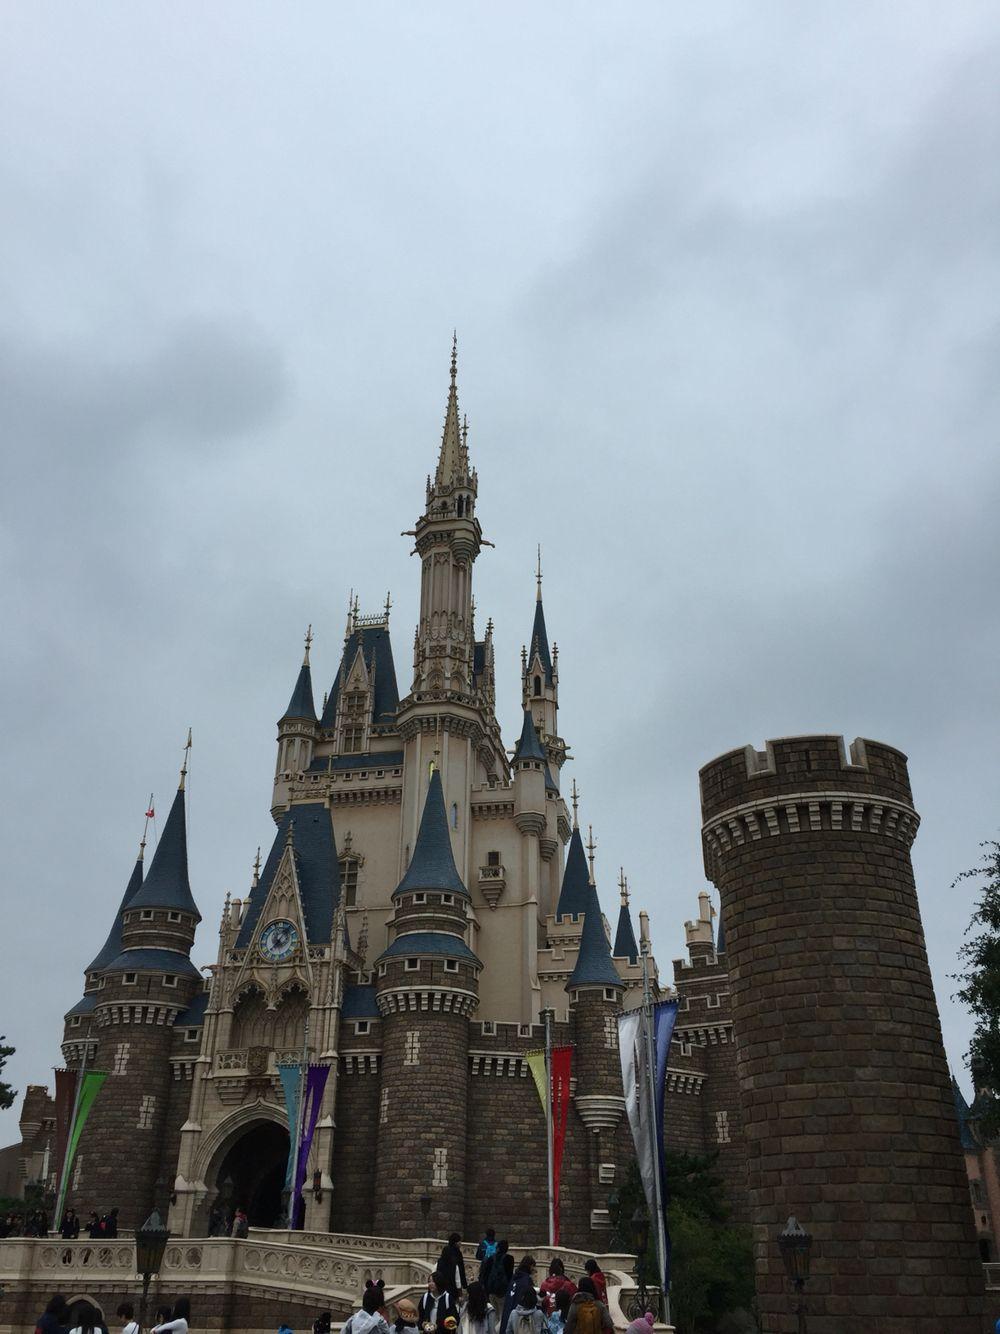 Tokyo Disneyland on a rainy day